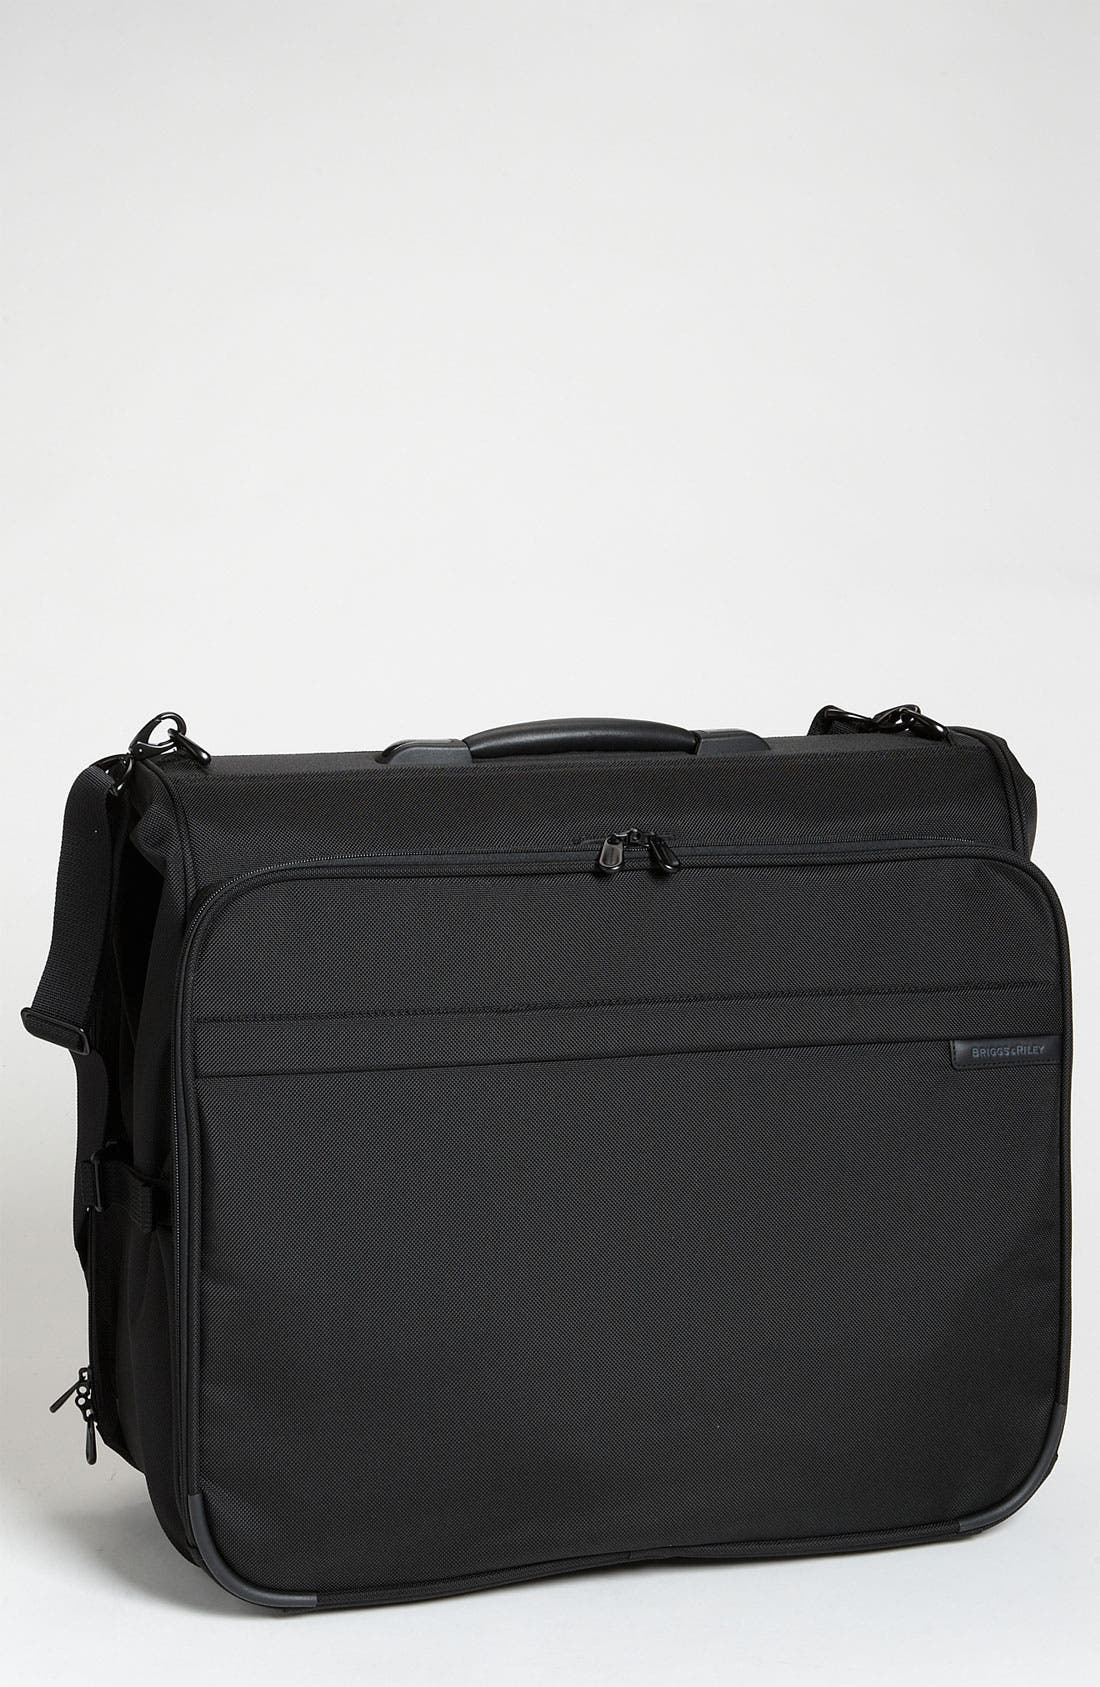 Main Image - Briggs & Riley 'Baseline - Deluxe' Garment Bag (22 Inch)